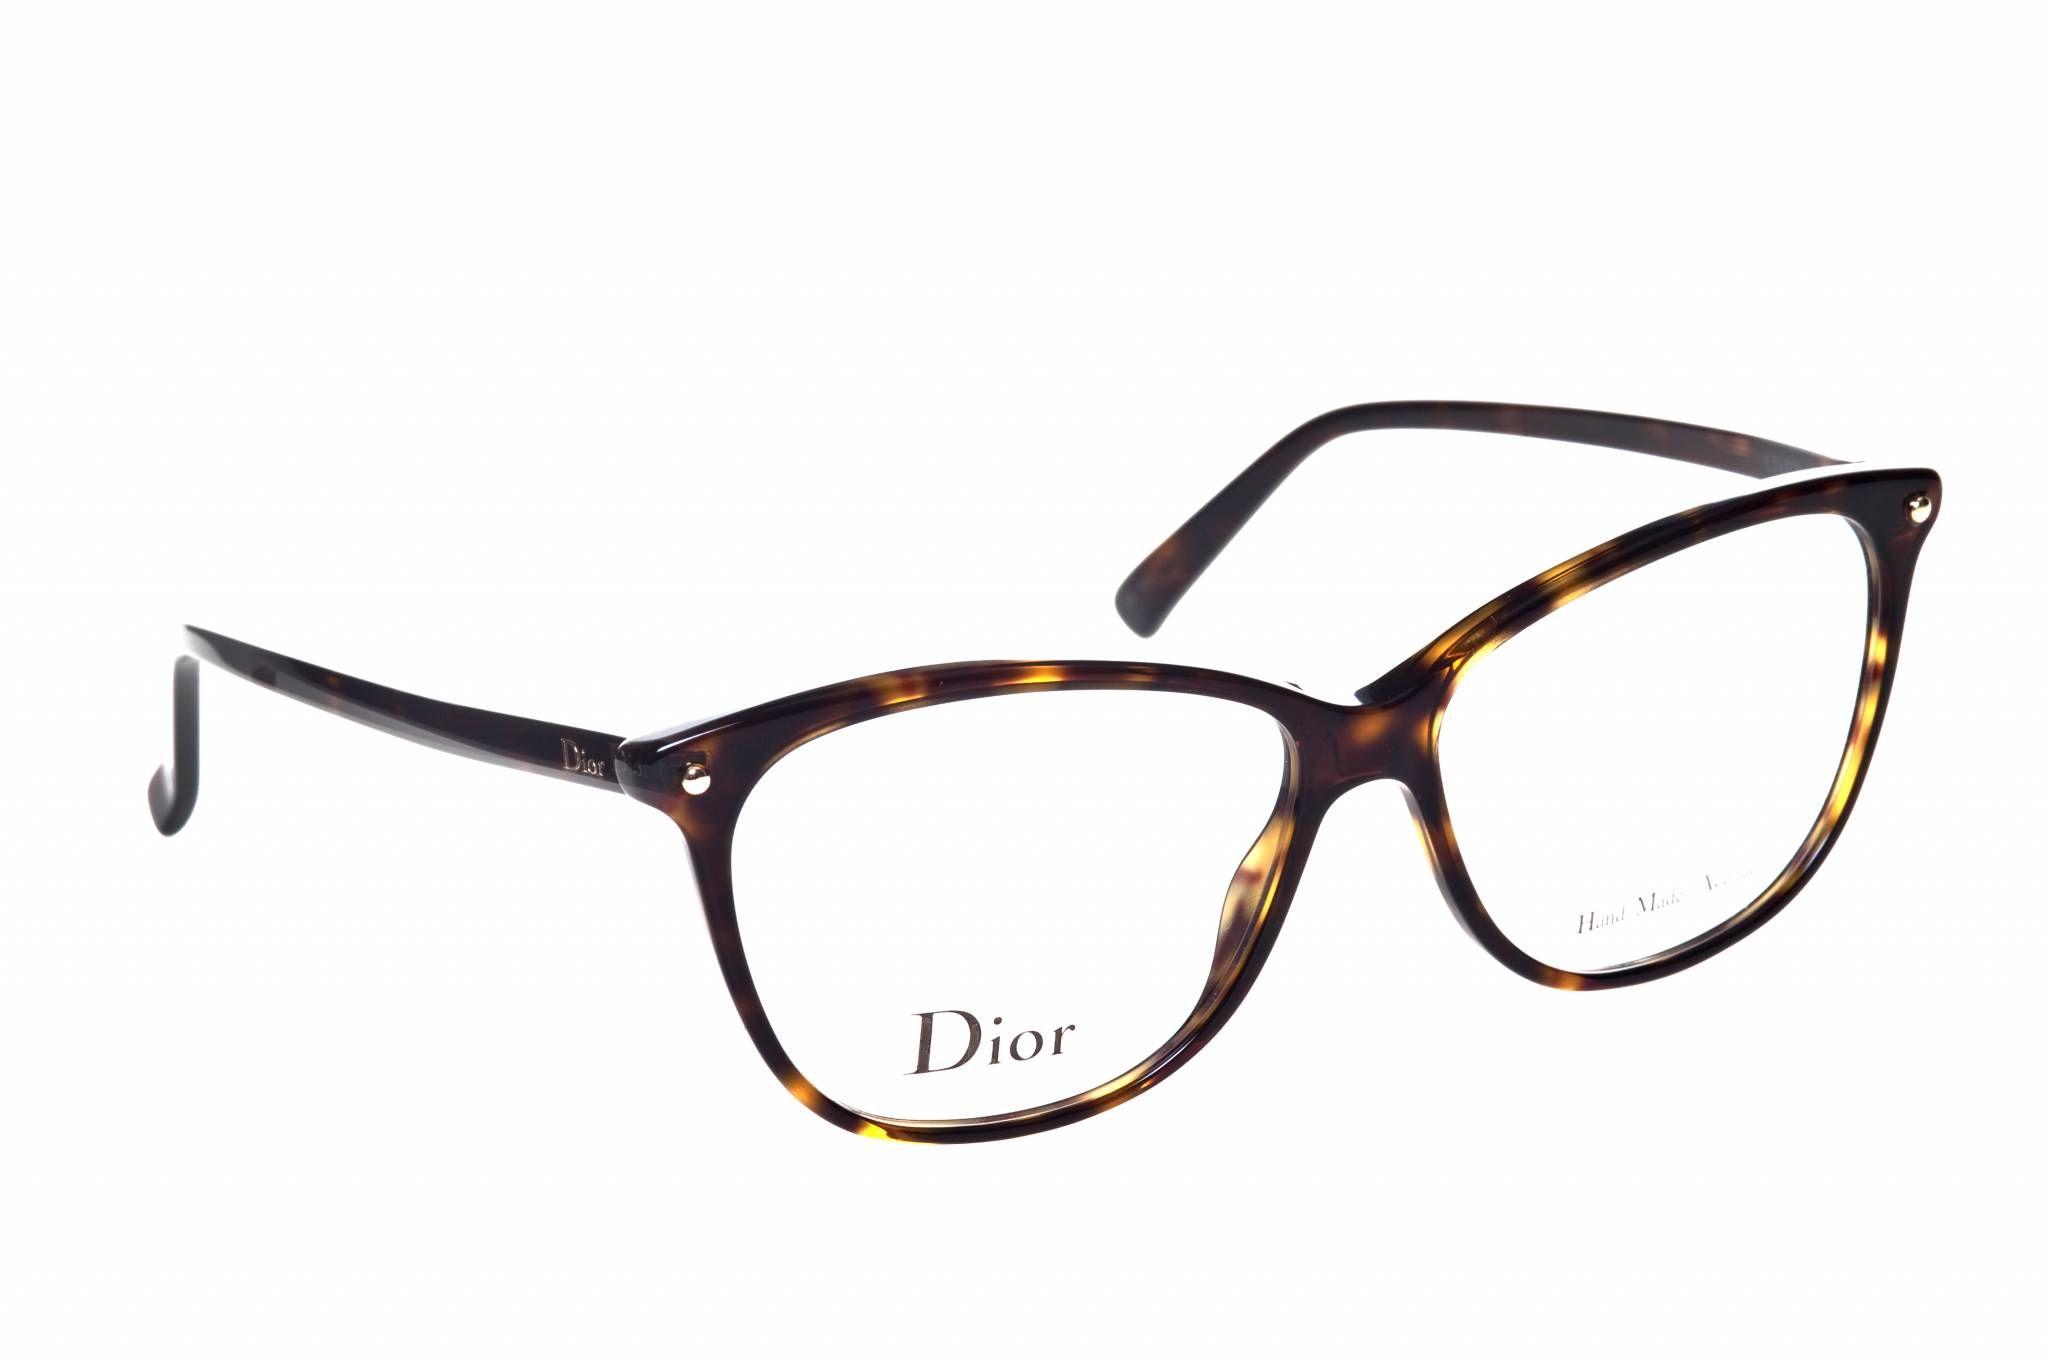 Dior Designerbrille CD 3270 086  Edle Brauntöne für strahlende Augen ... 8acef081e2e36